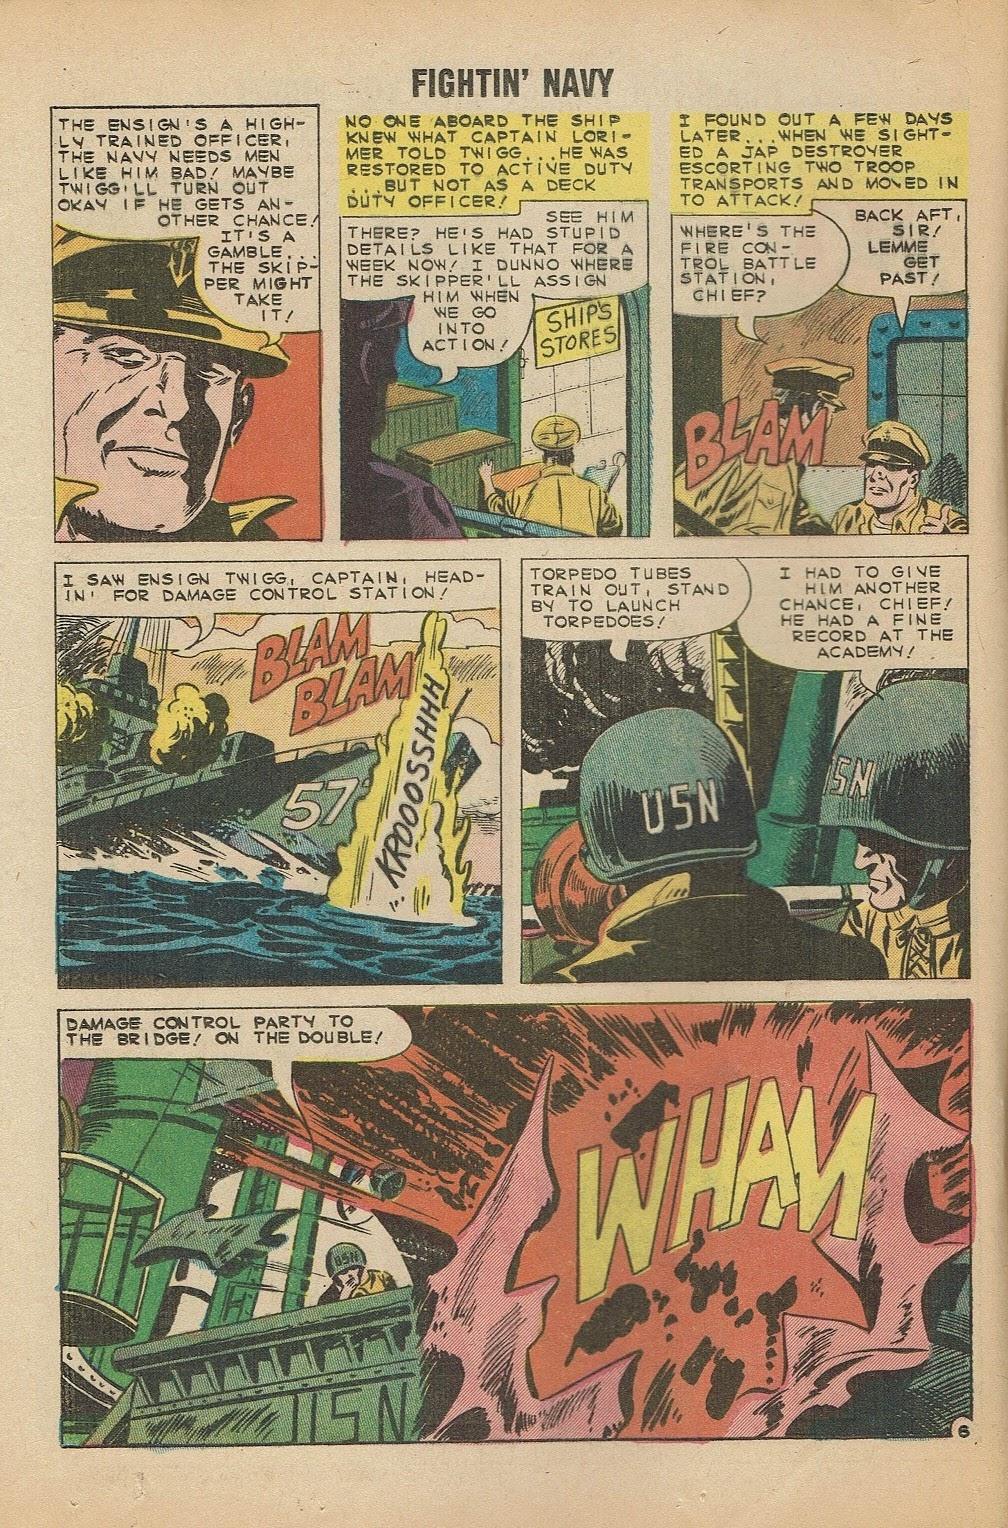 Read online Fightin' Navy comic -  Issue #91 - 20